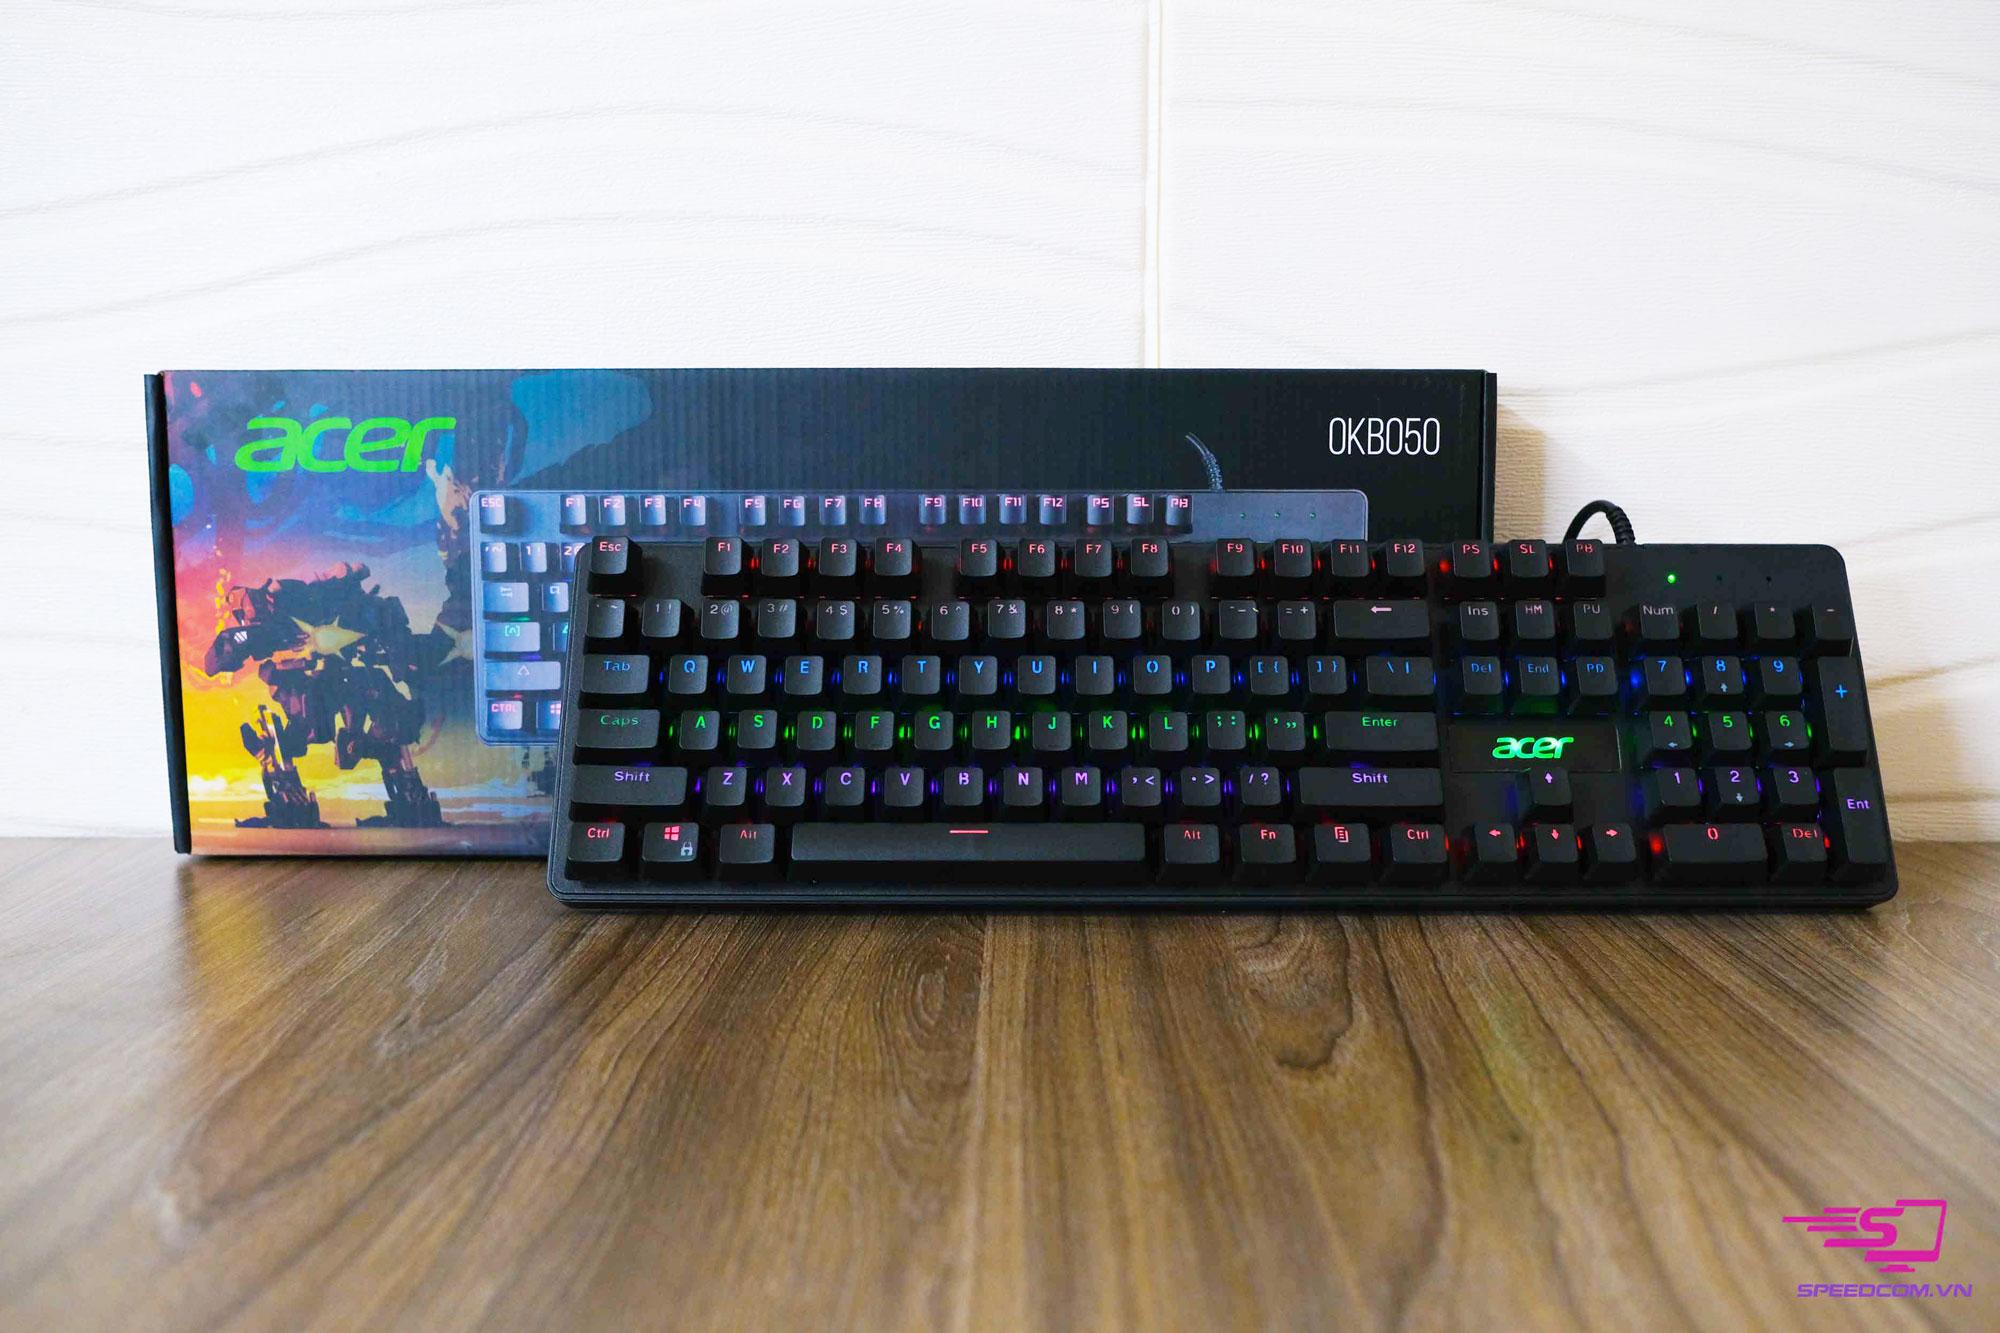 Bàn phím máy tính Acer OKB 050